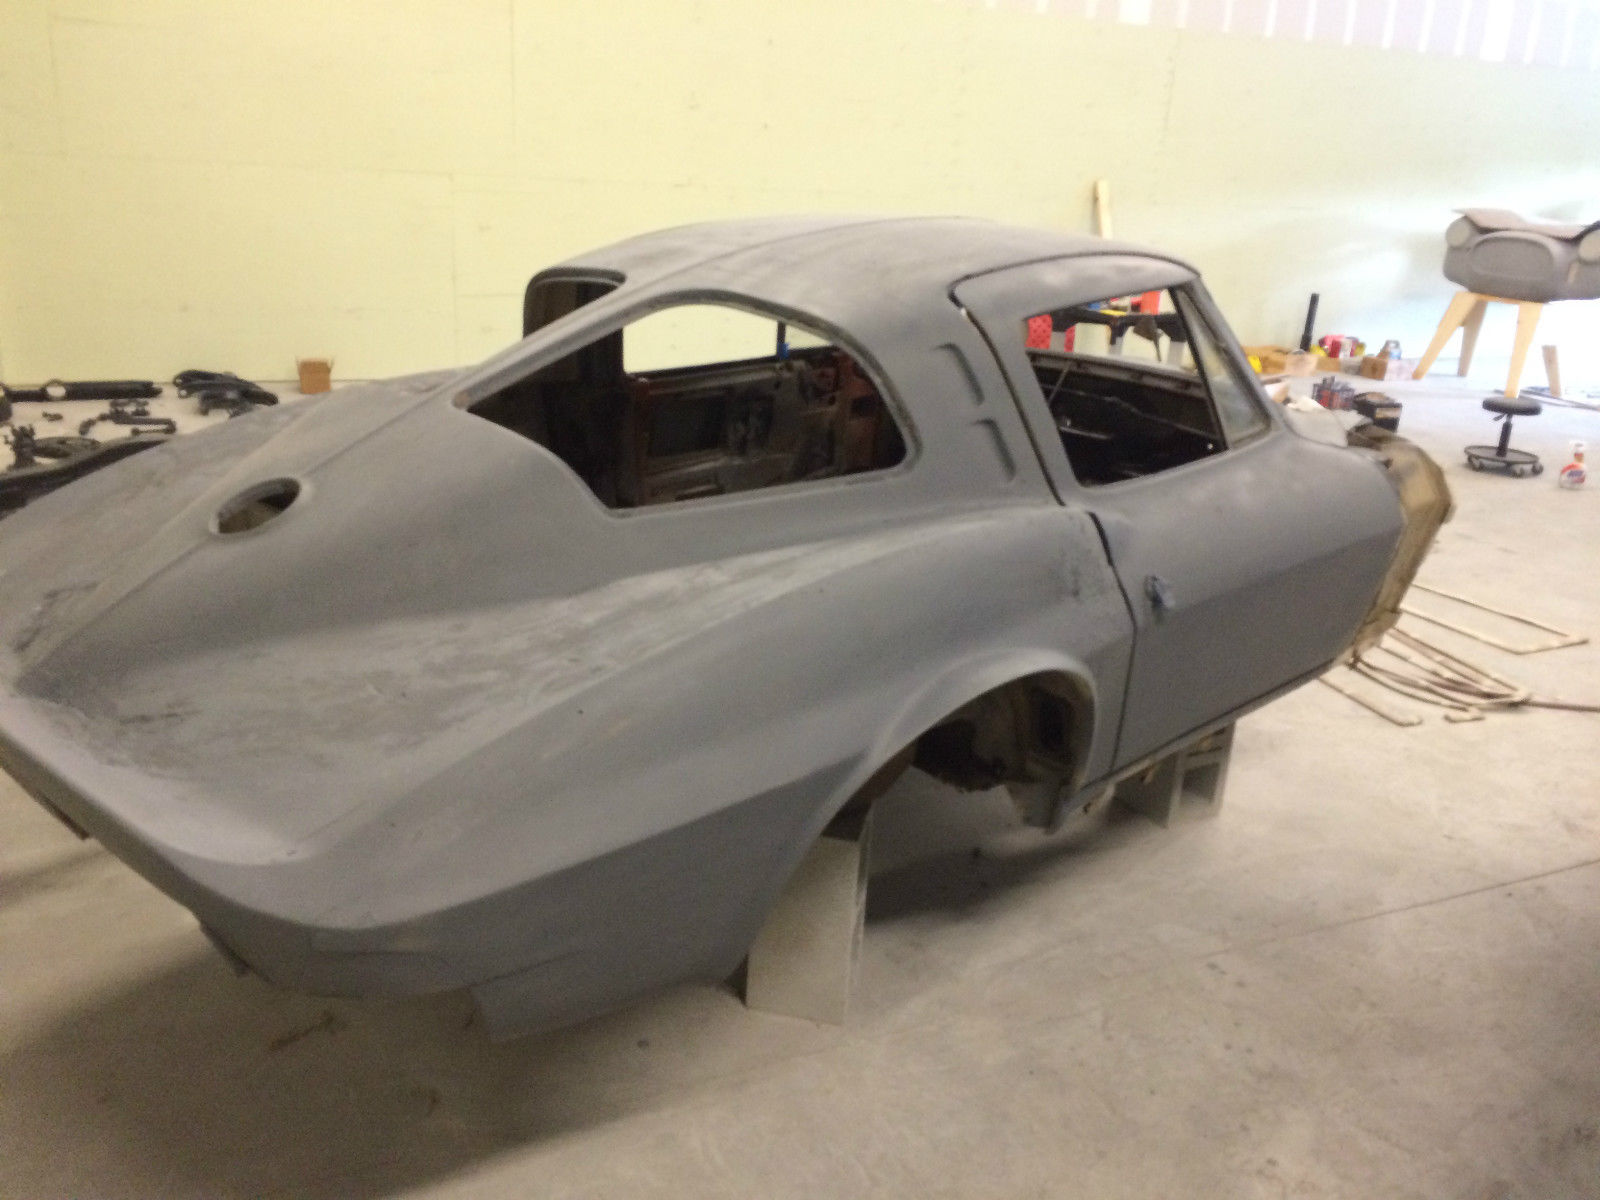 1963 corvette split window c2 project clean title for 1963 split window corvette project for sale